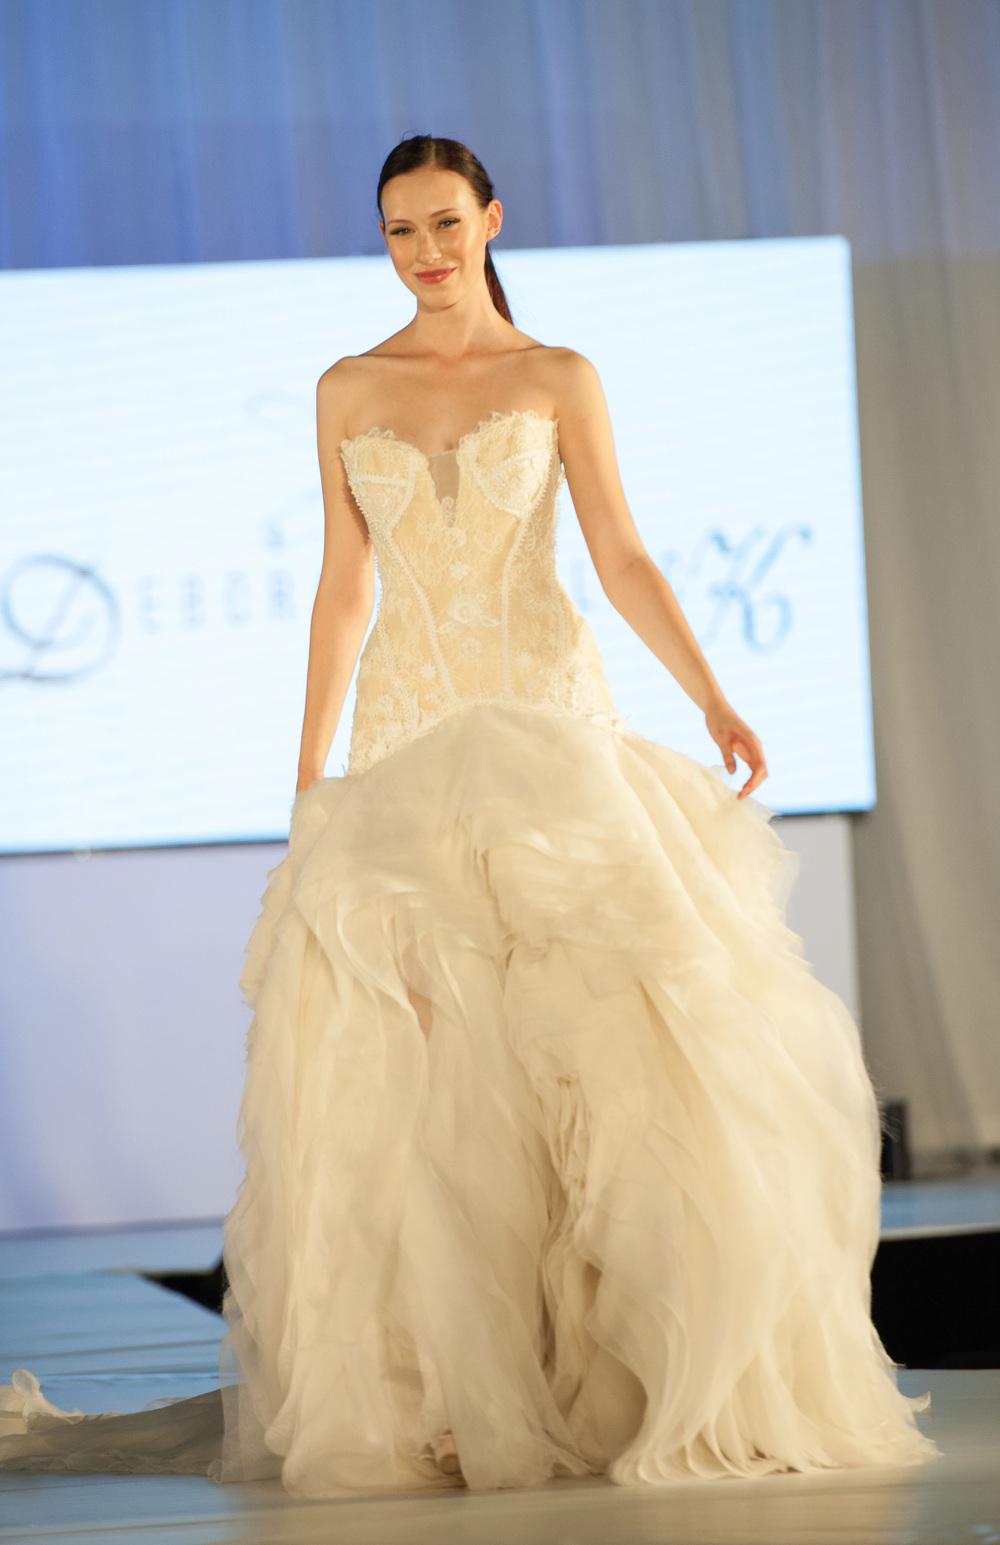 Couture wedding dress designers melbourne wedding for Wedding dresses under 3000 melbourne